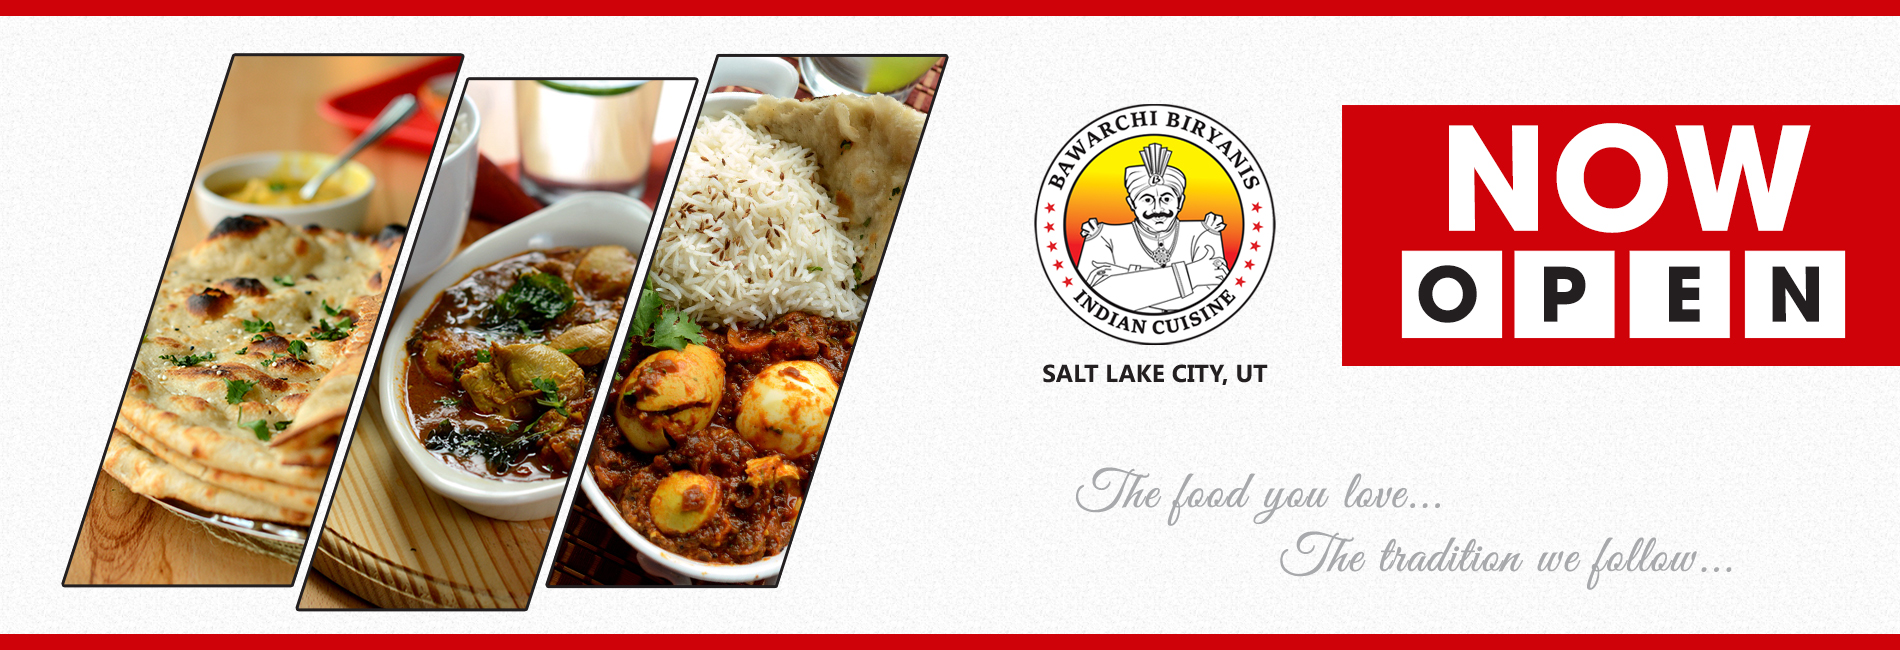 Bawarchi Salt Lake - Now Open